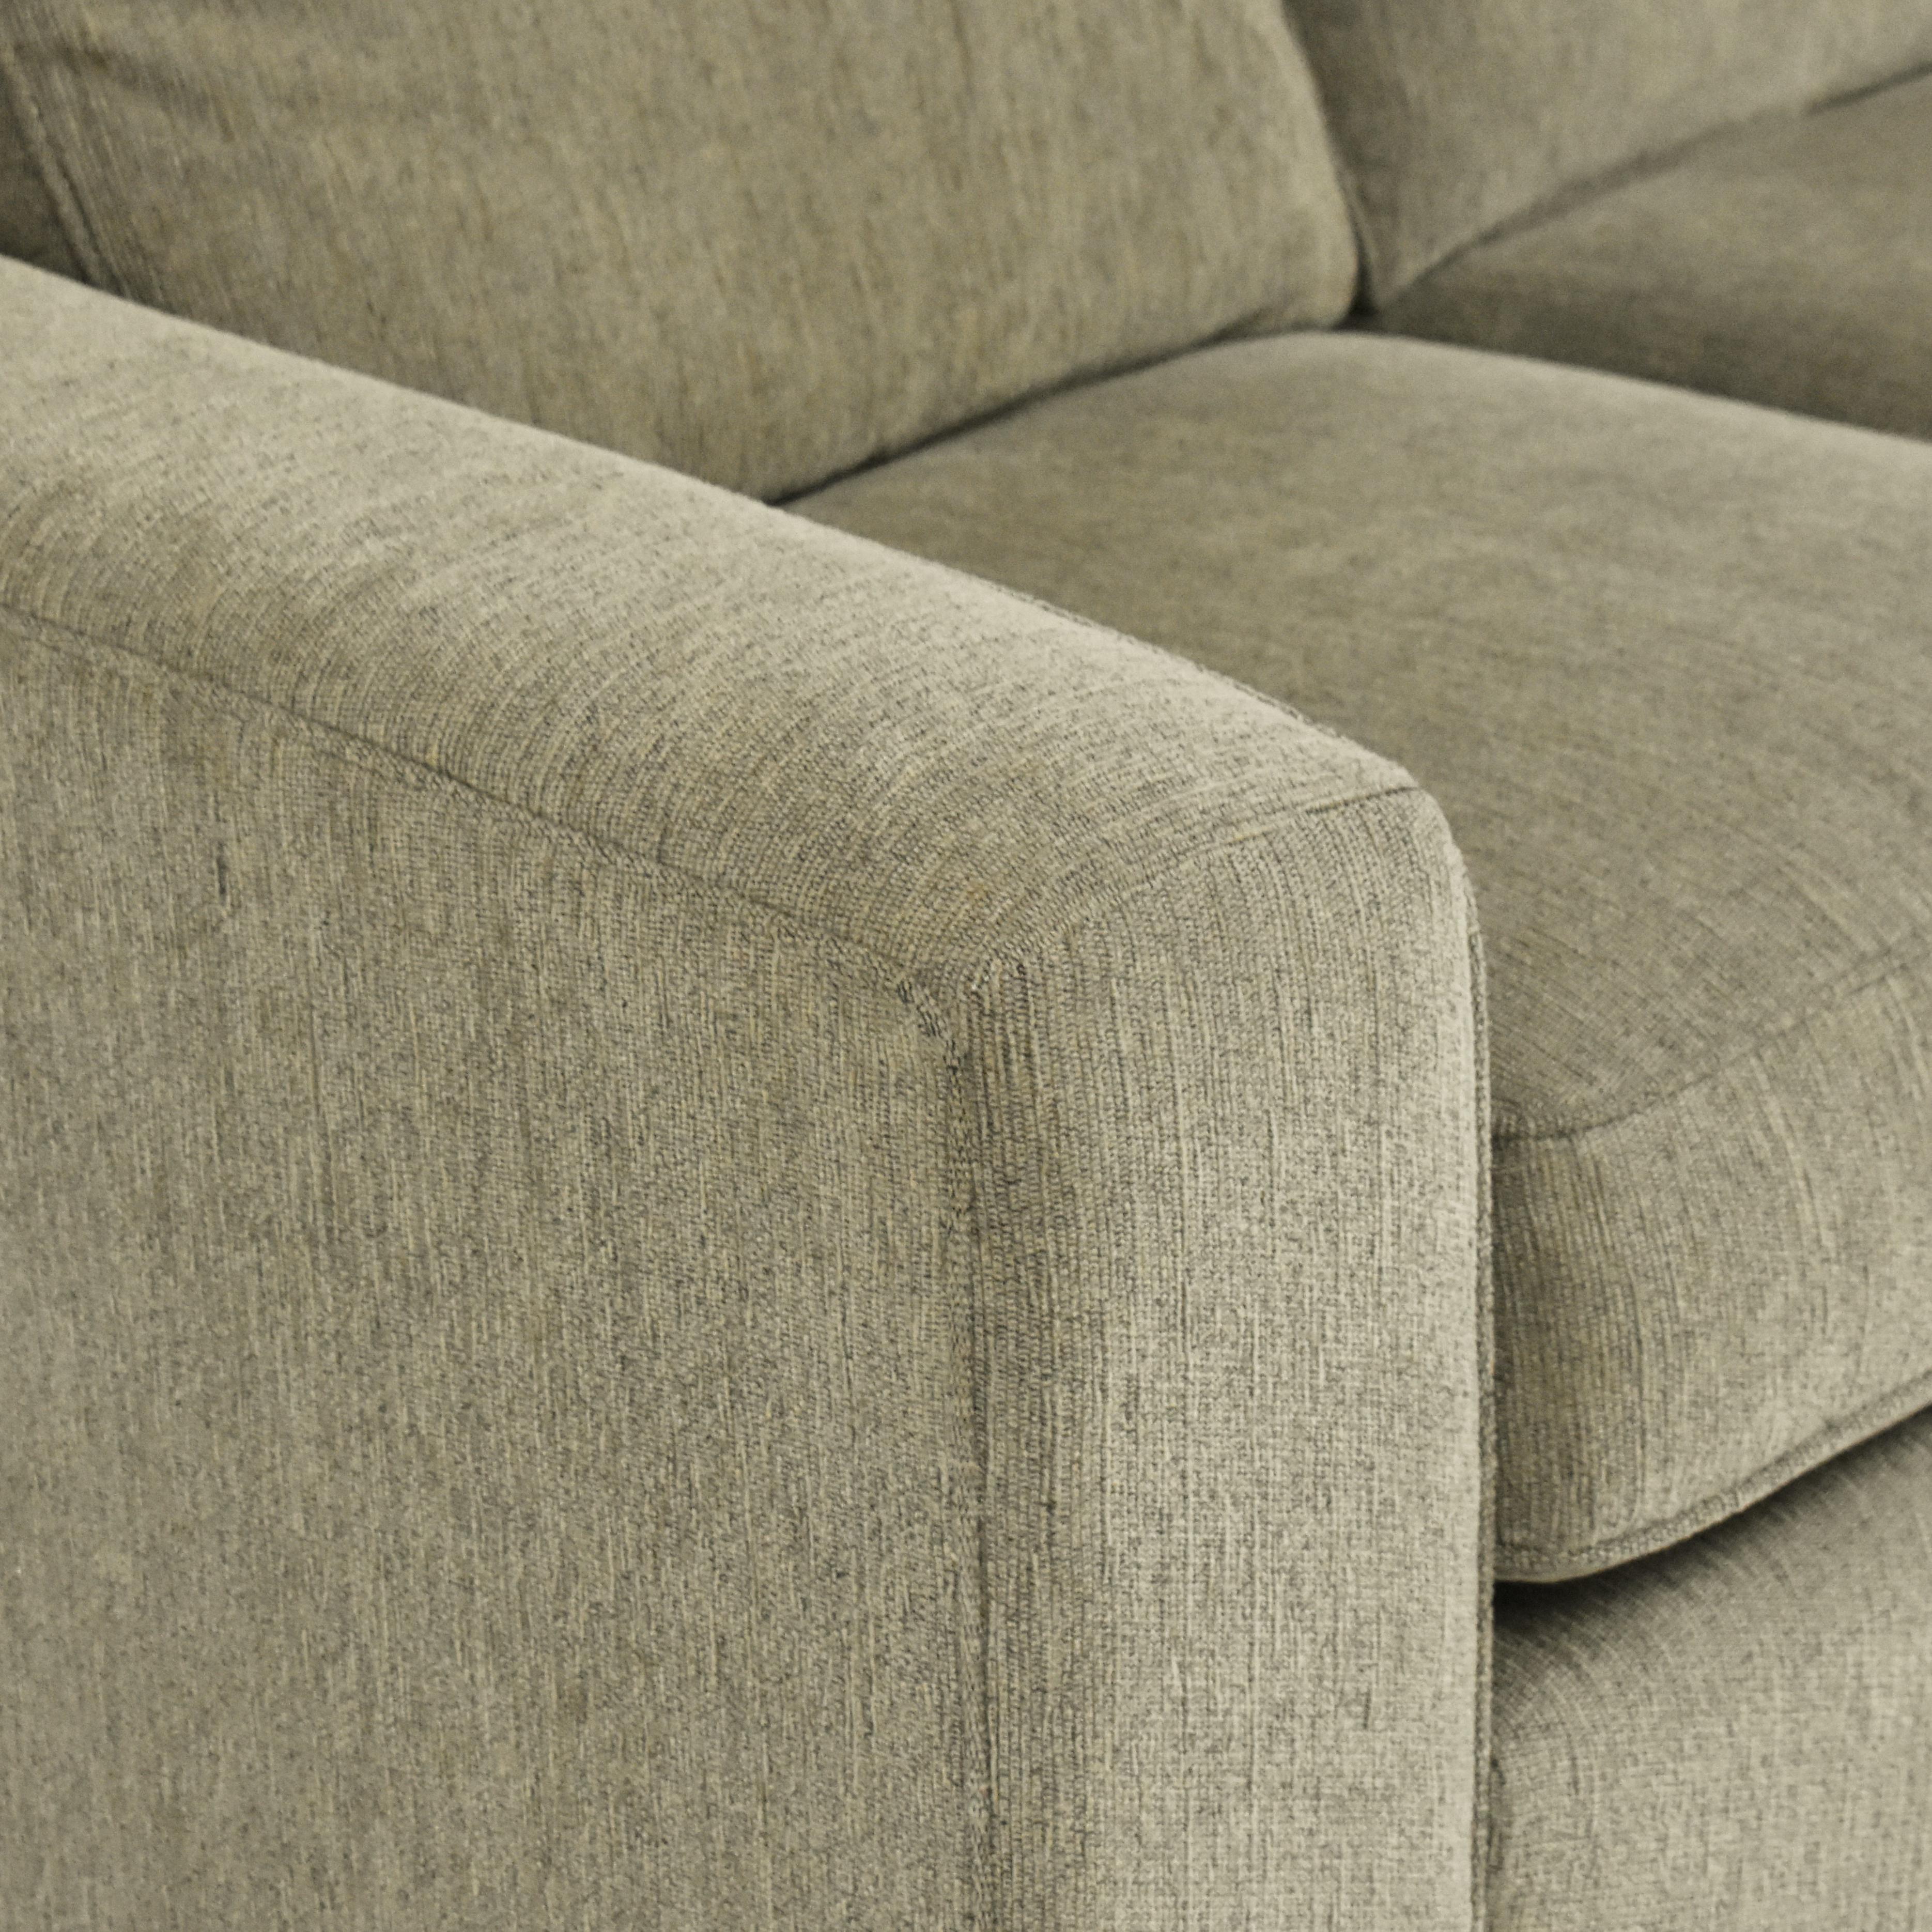 Bloomingdale's Left Arm Sofa / Classic Sofas